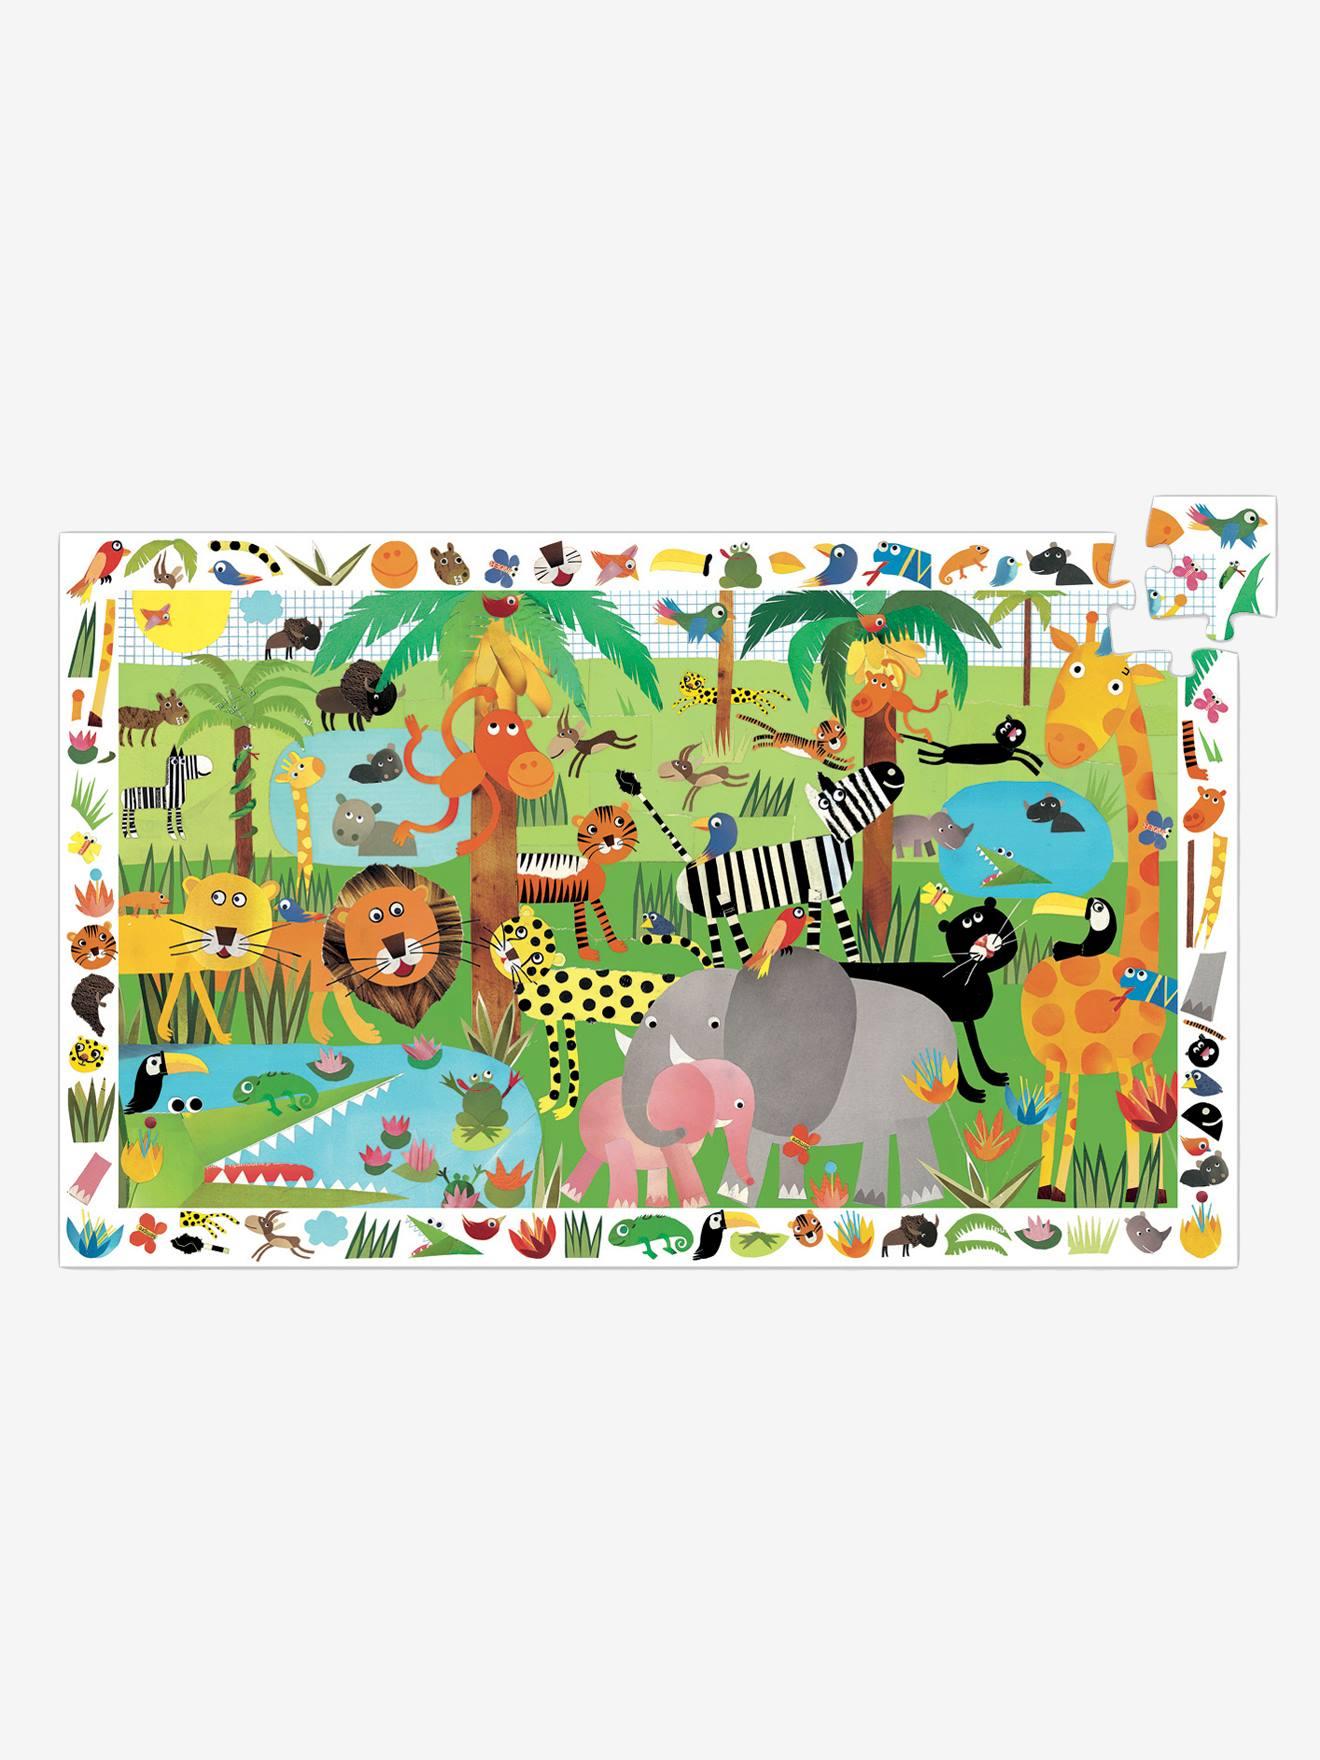 Puzzle observation La jungle 35 pièces DJECO multicolore